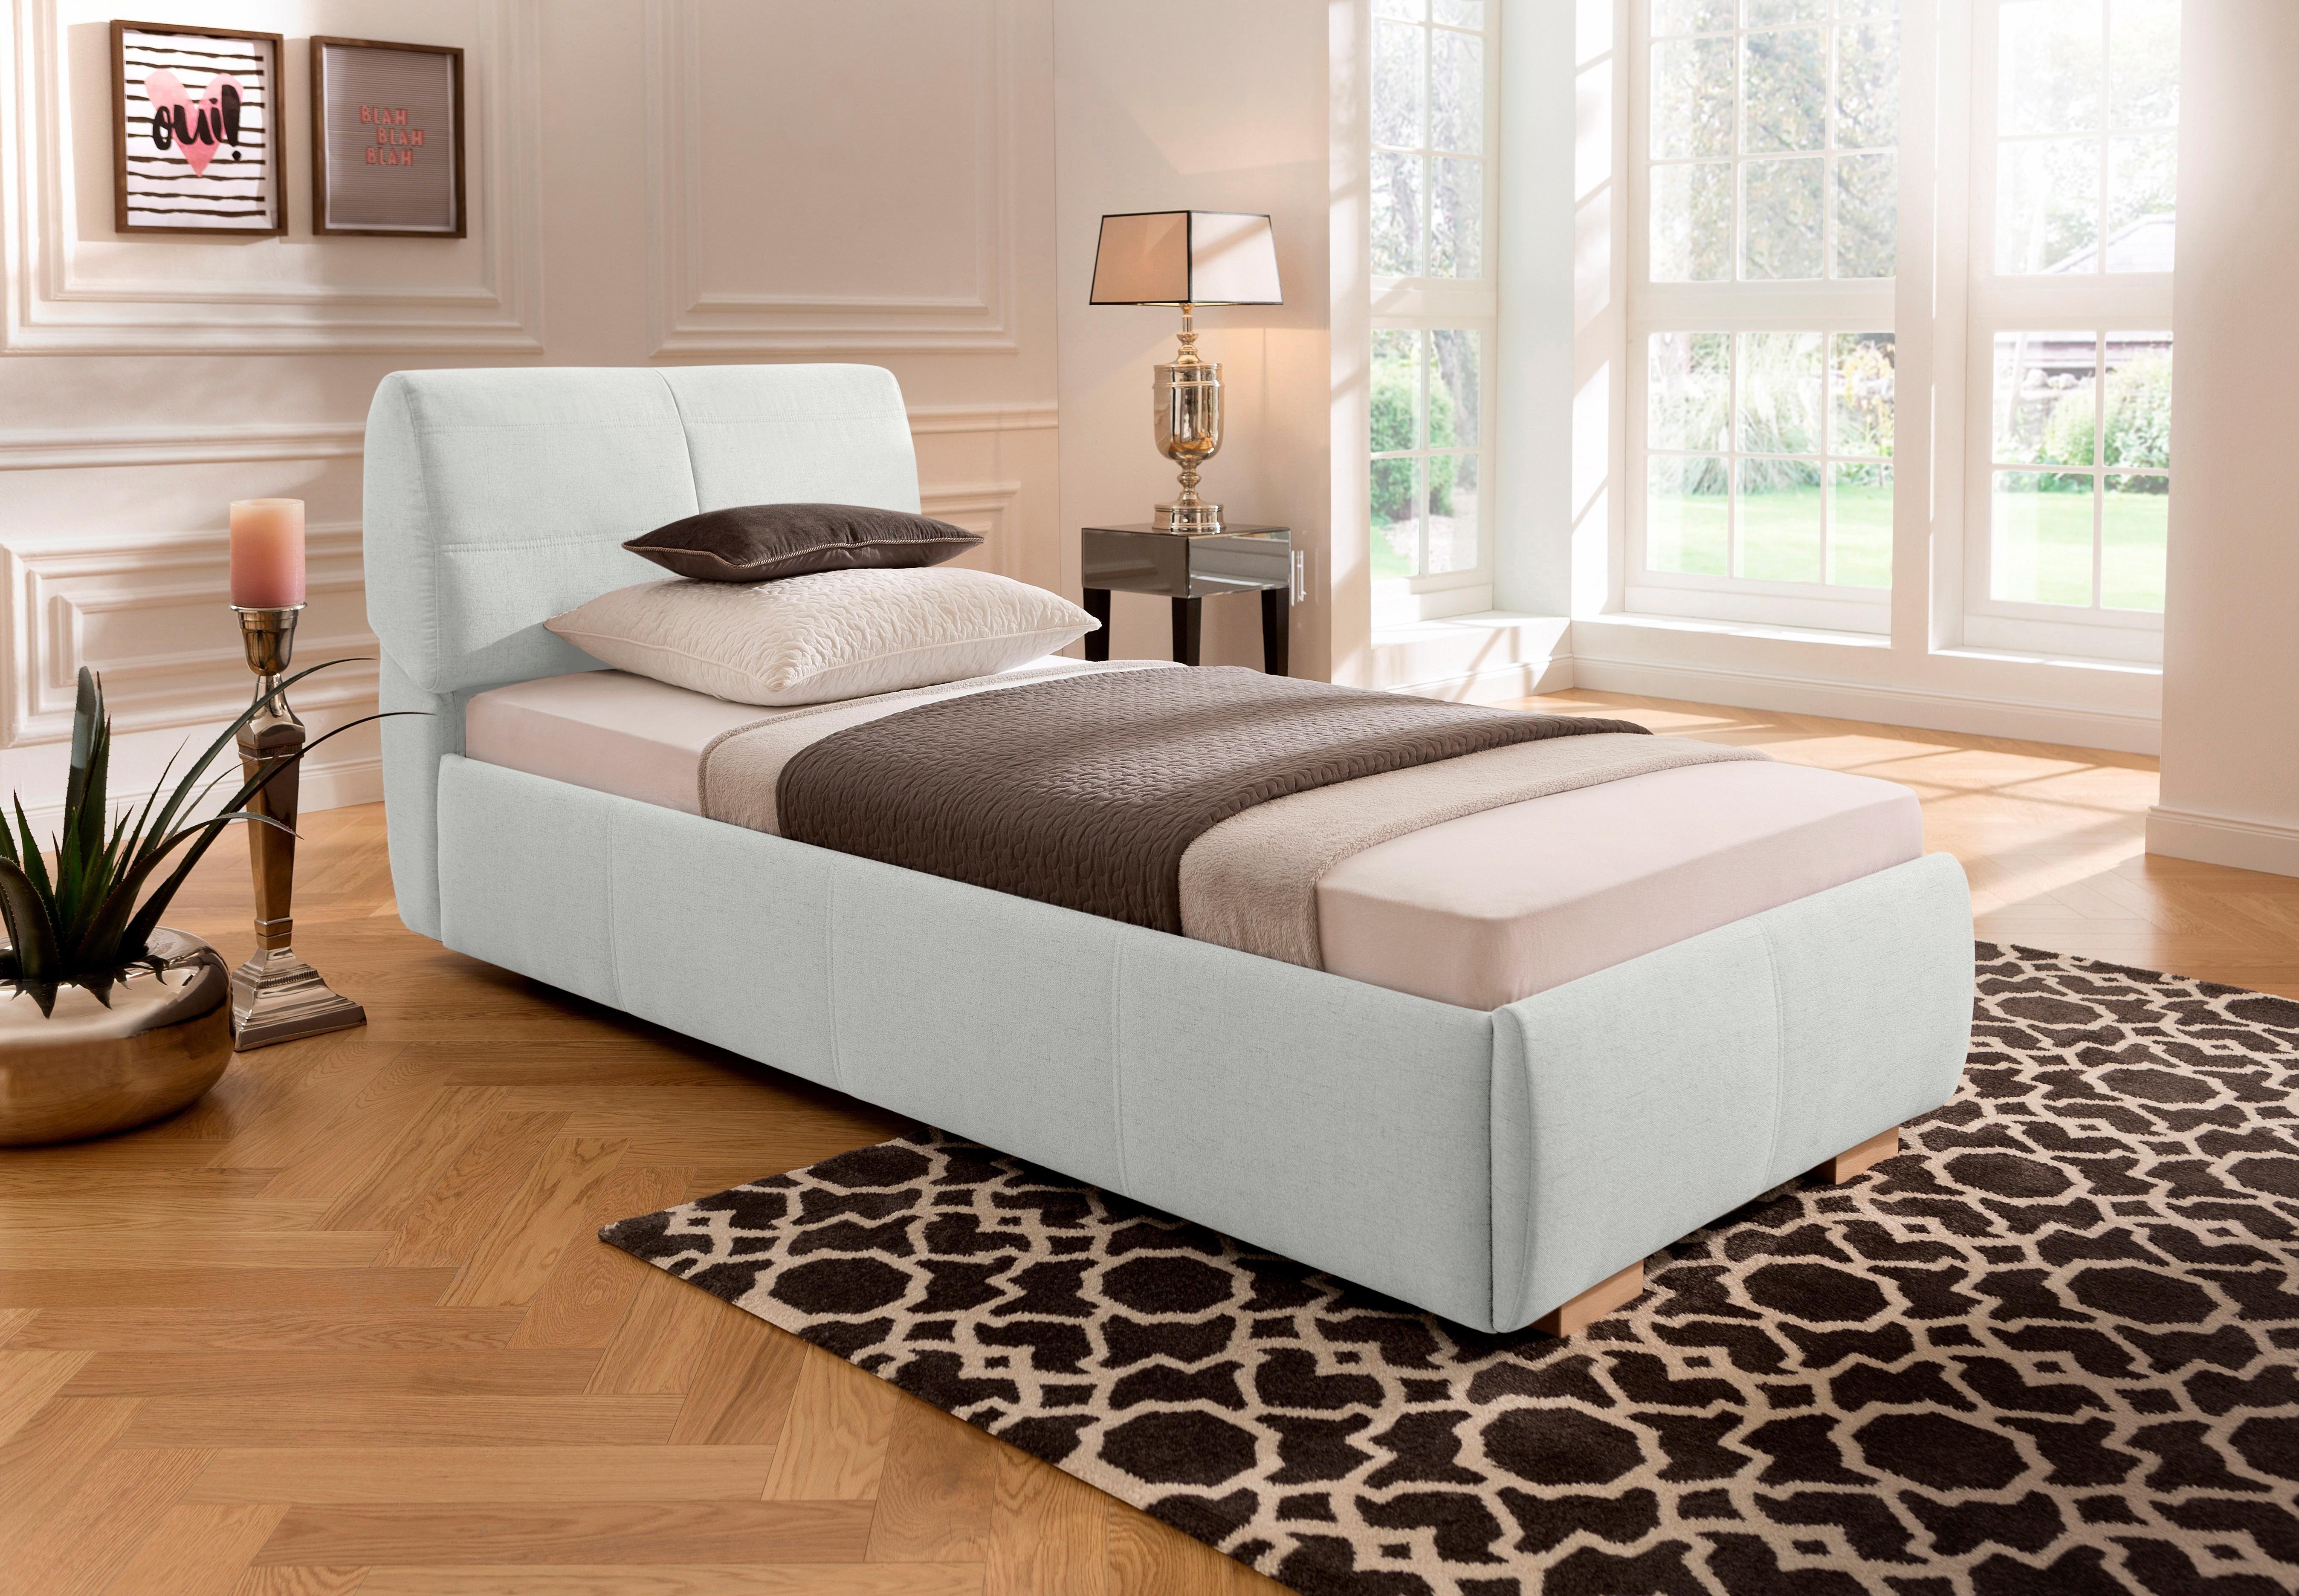 50 sparen home affaire polsterbett solaris nur 349 99. Black Bedroom Furniture Sets. Home Design Ideas